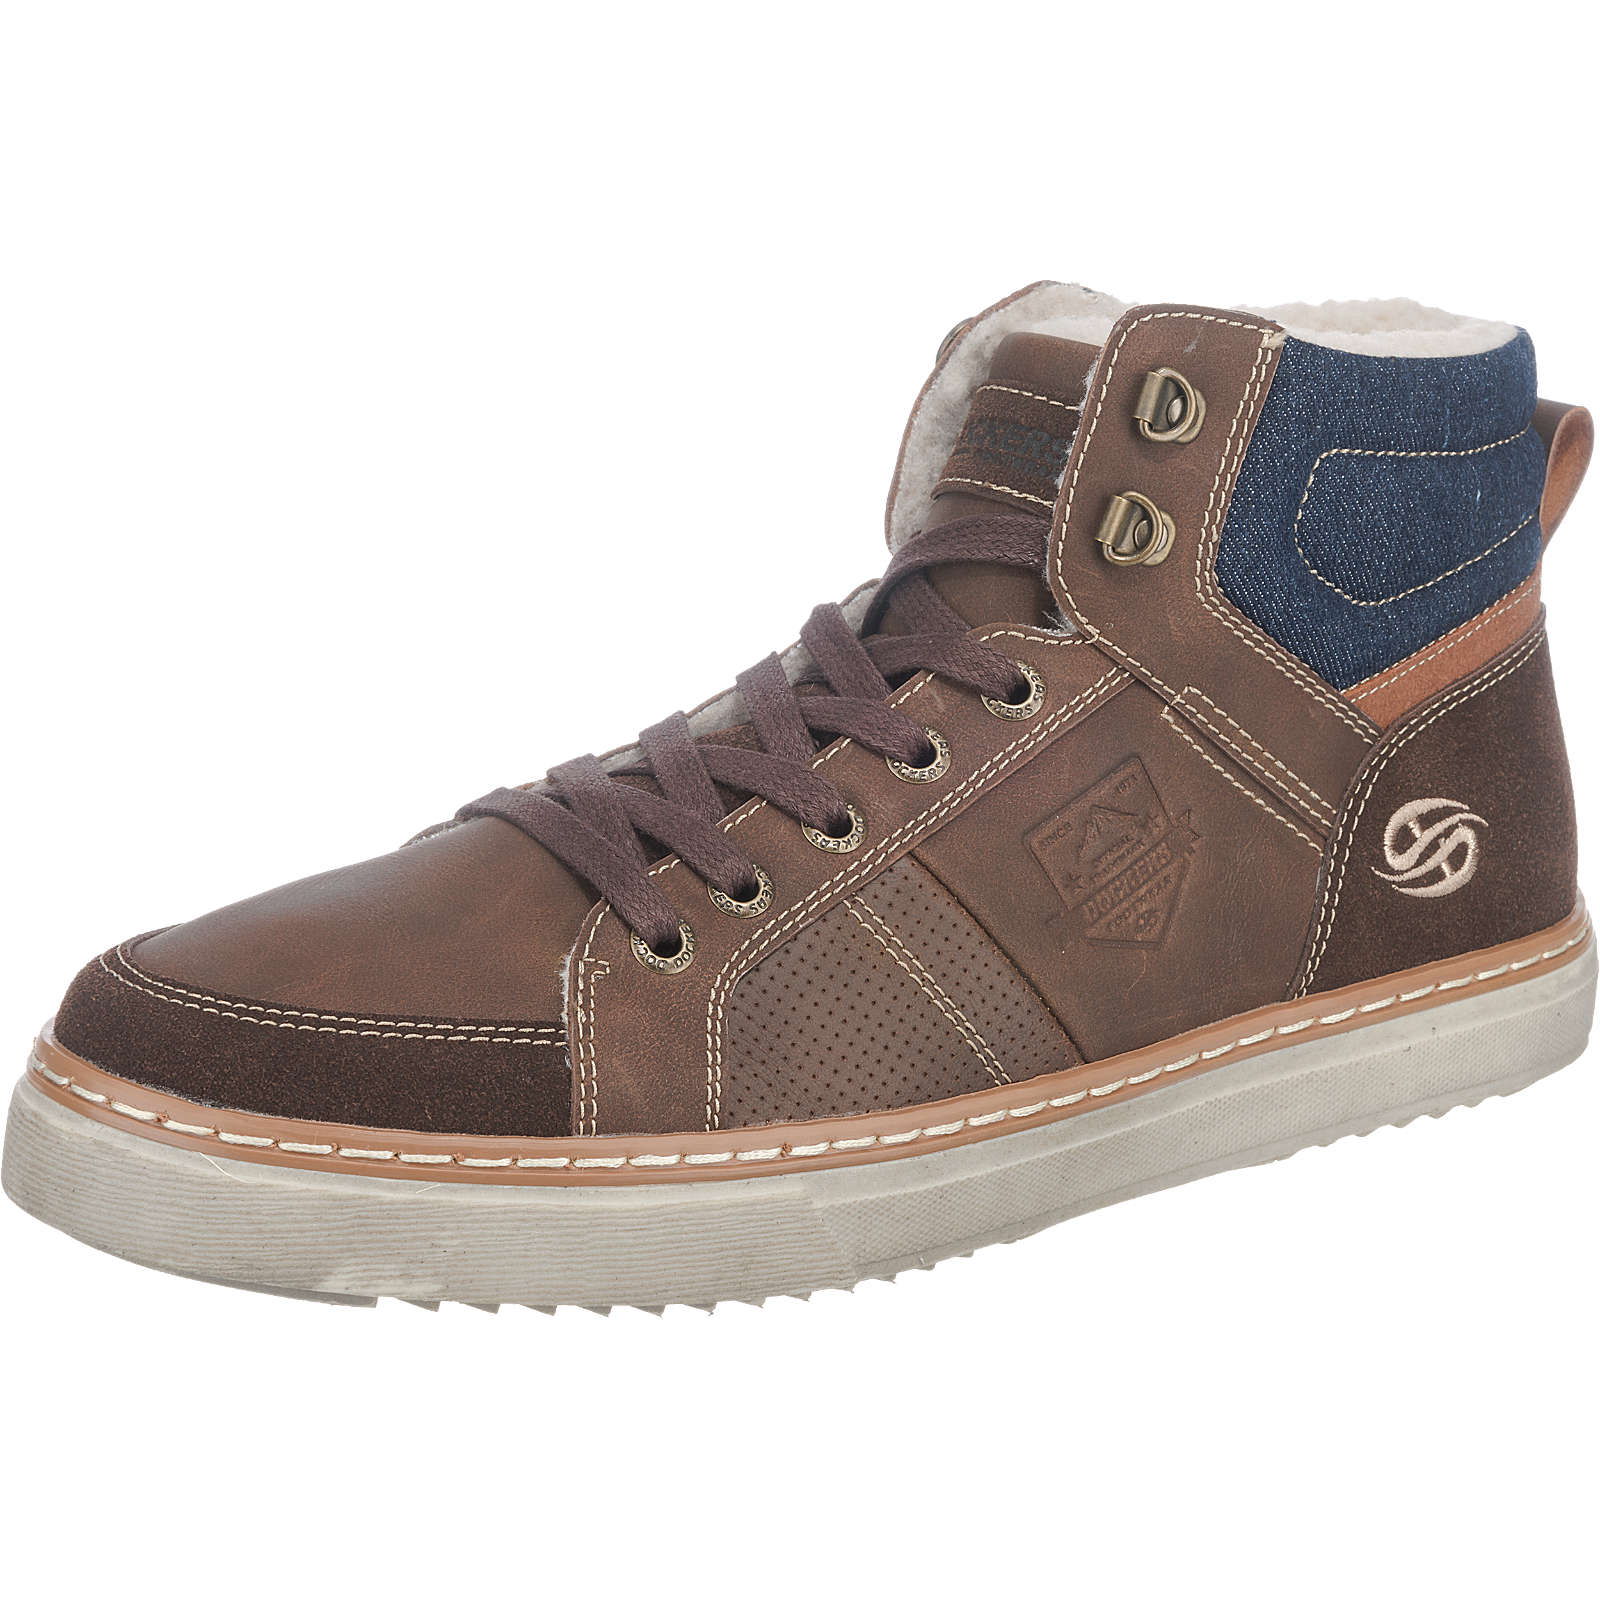 Dockers by Gerli Sneakers braun-kombi Herren Gr. 42